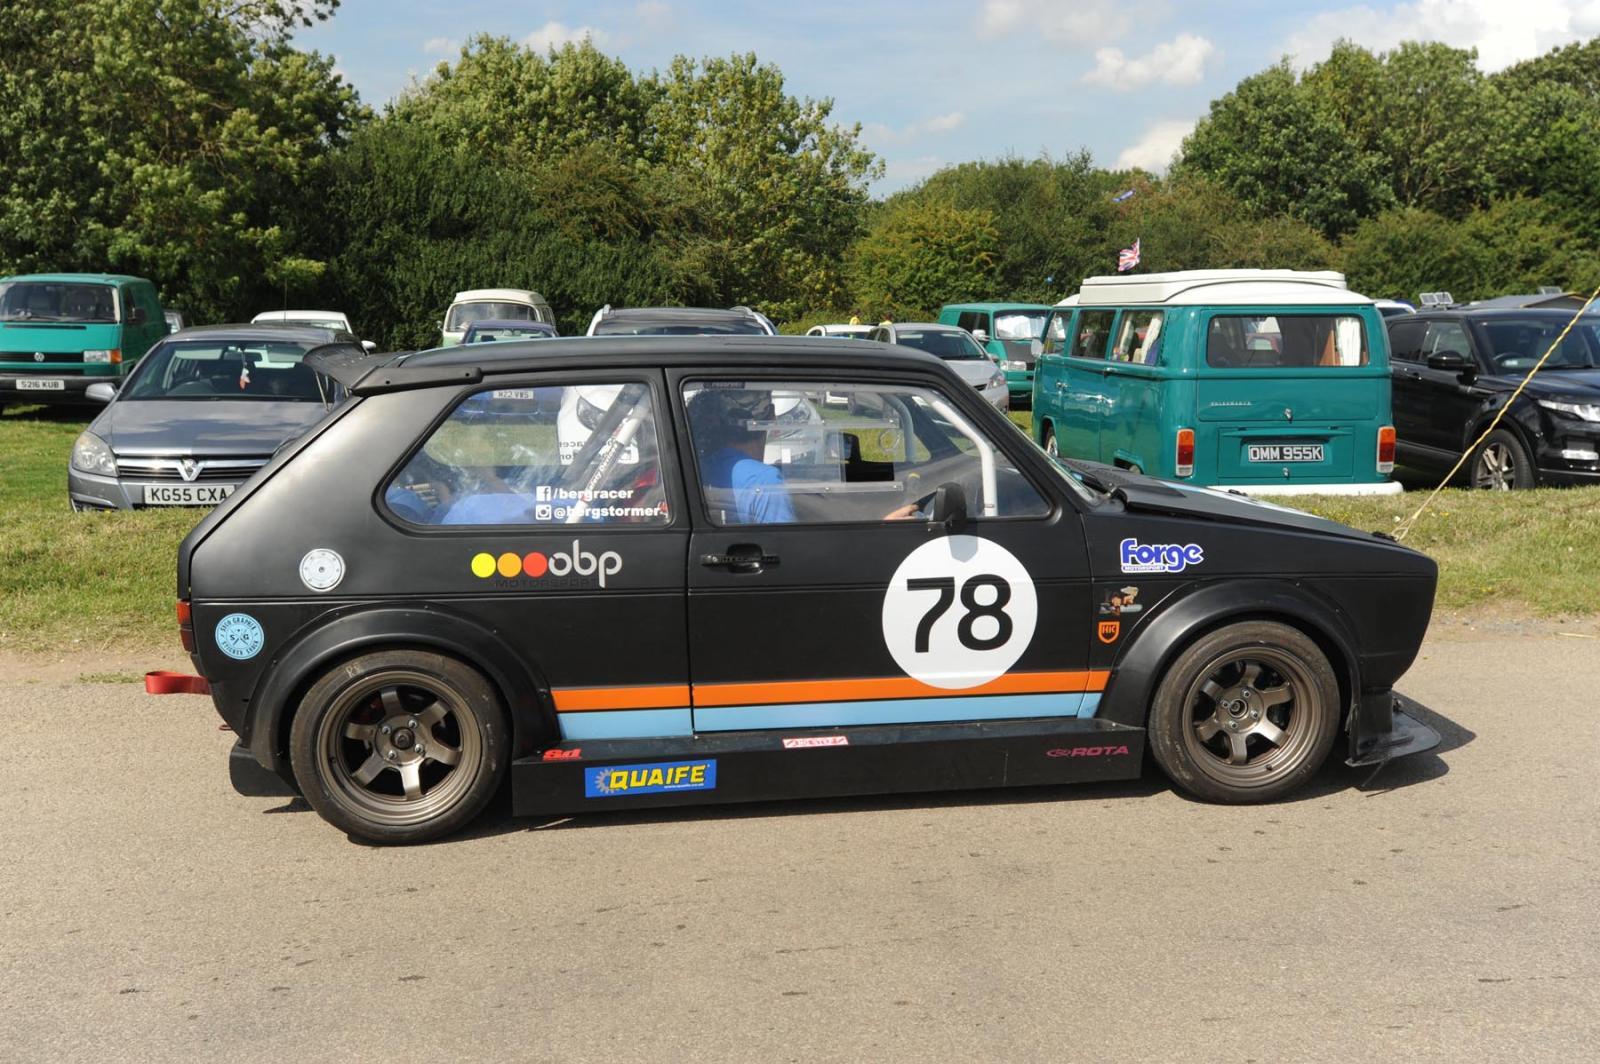 VW Action 2015 at Santa Pod Raceway UK